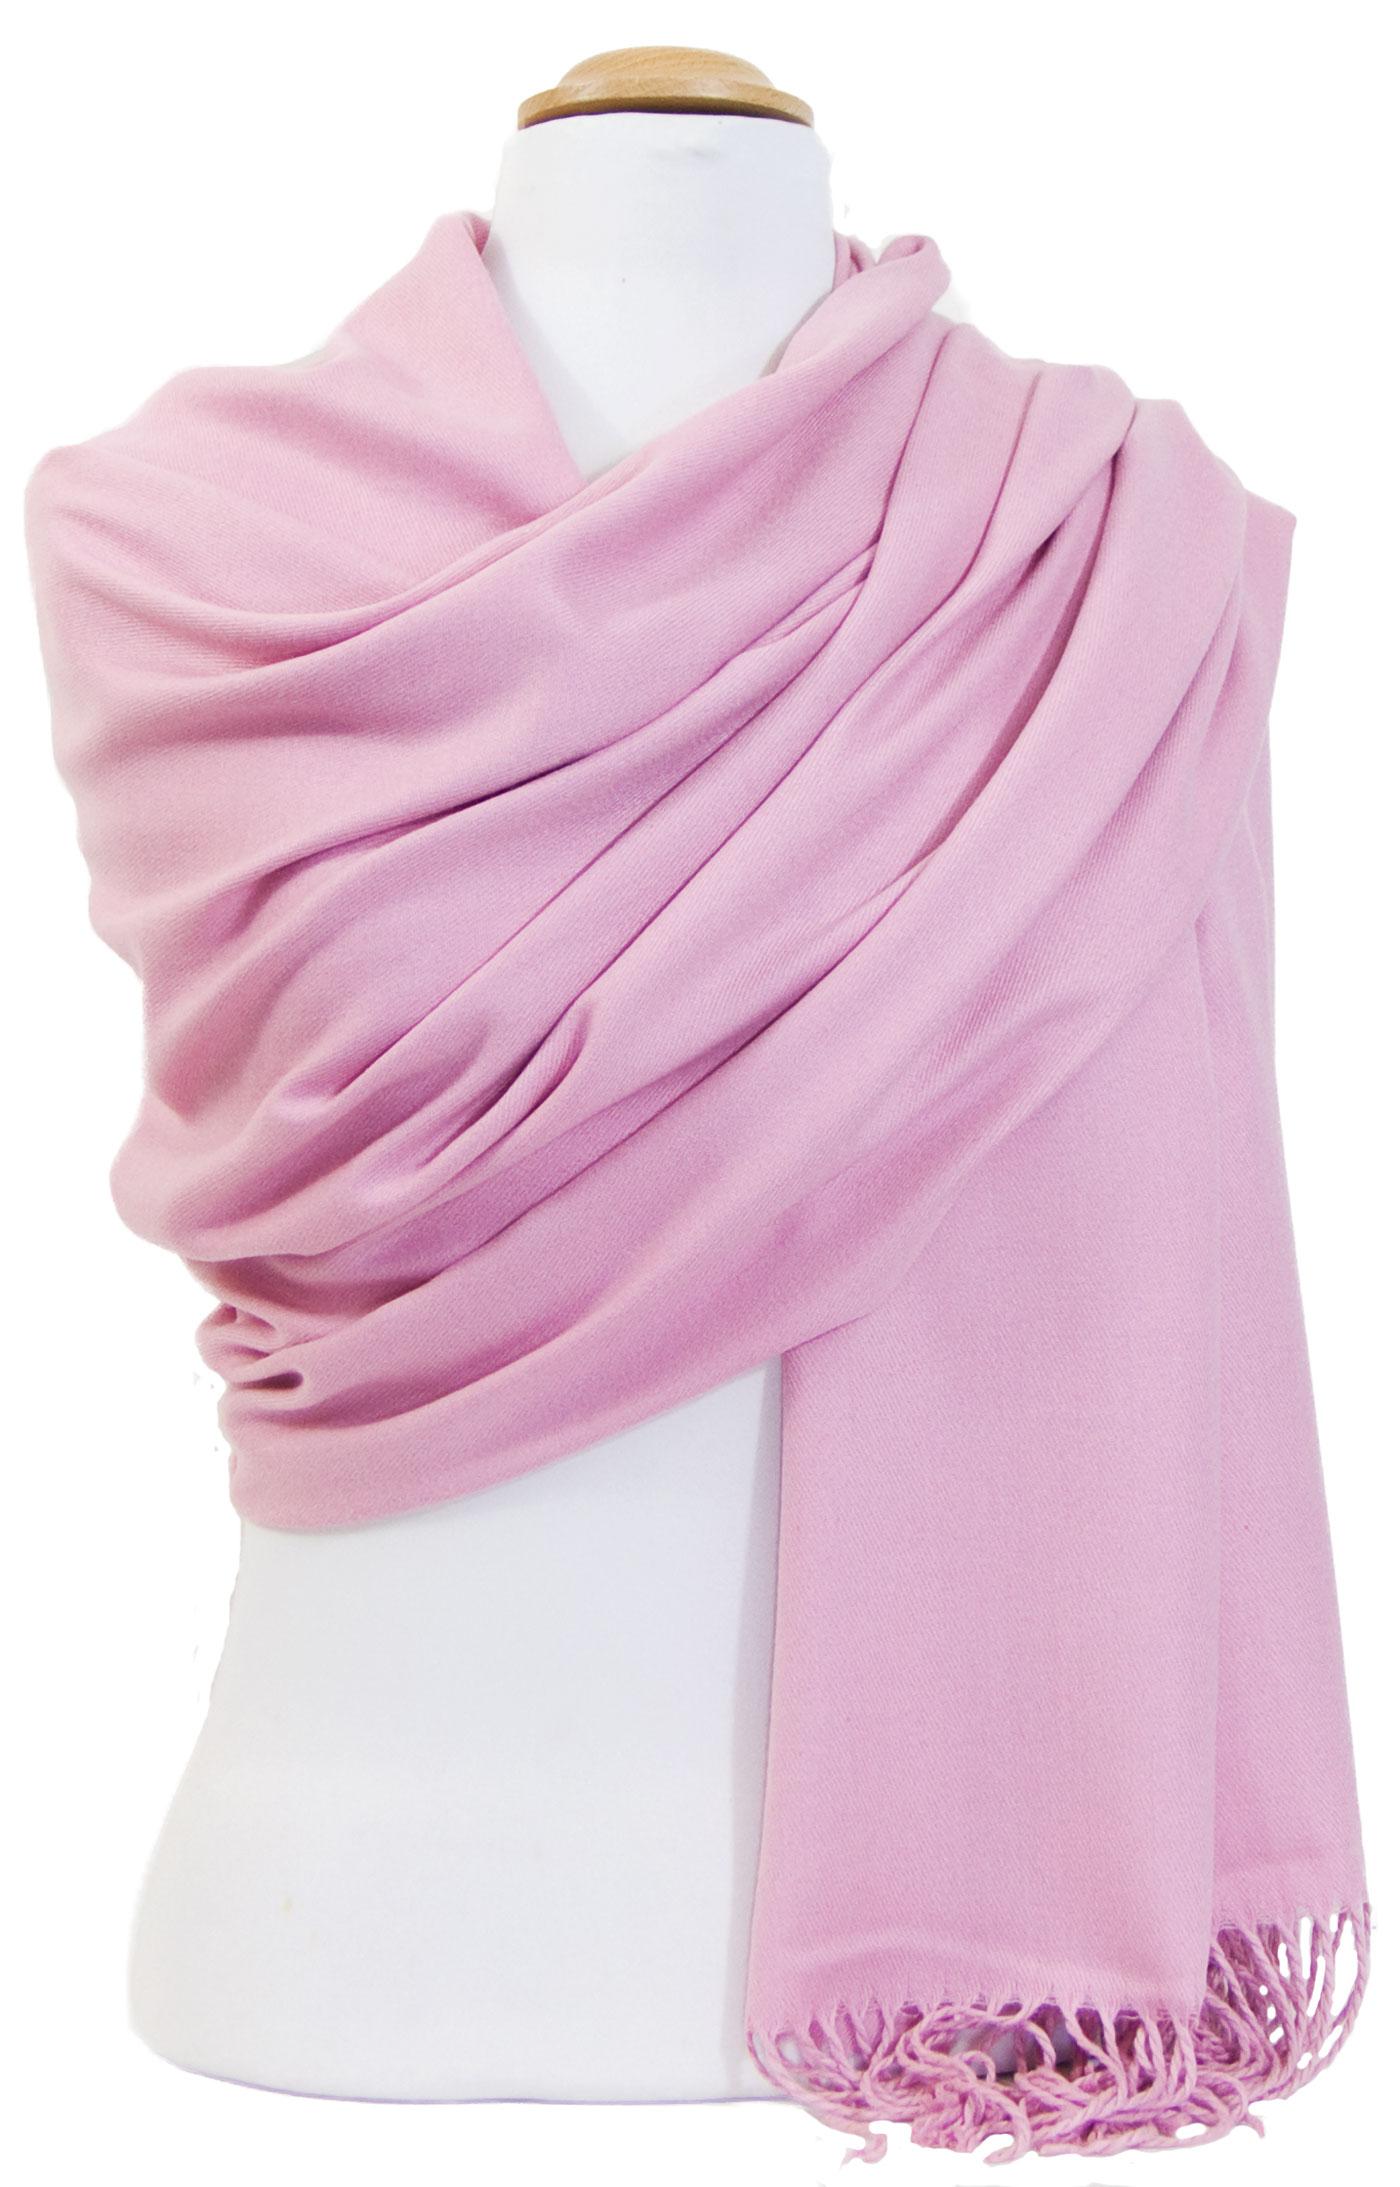 Etole cachemire laine rose Charlie